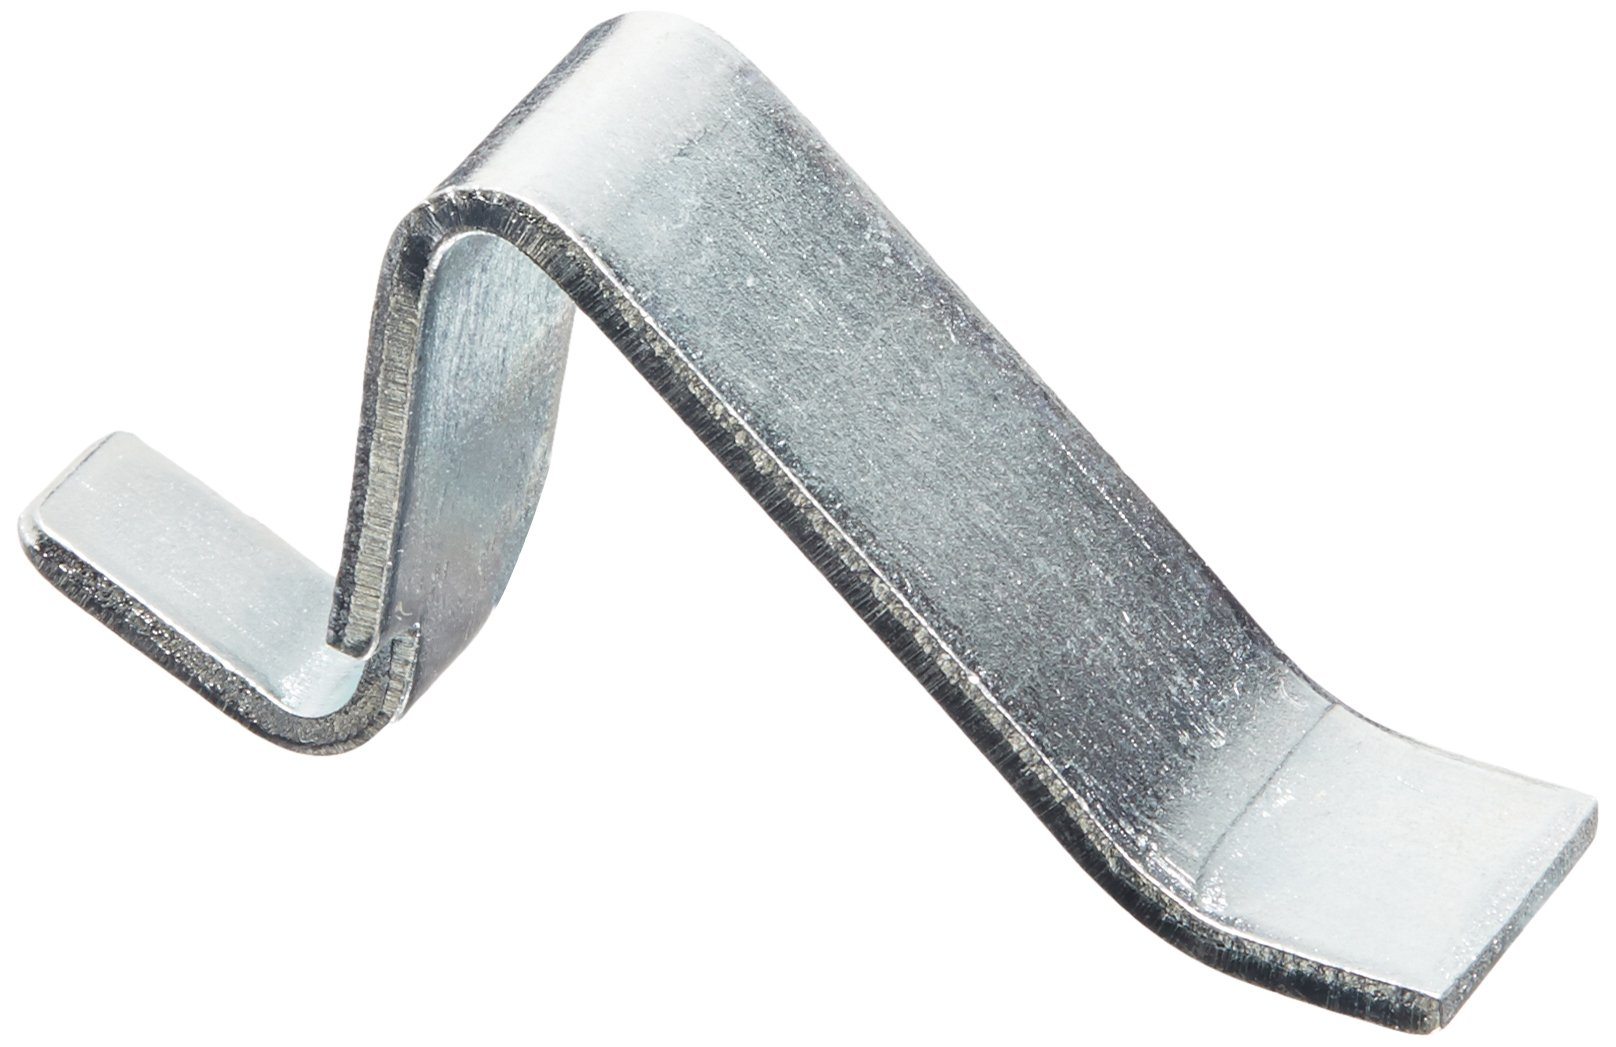 Sandusky Lee Sclip Shelf Clips Pack Of 4 0017567102900